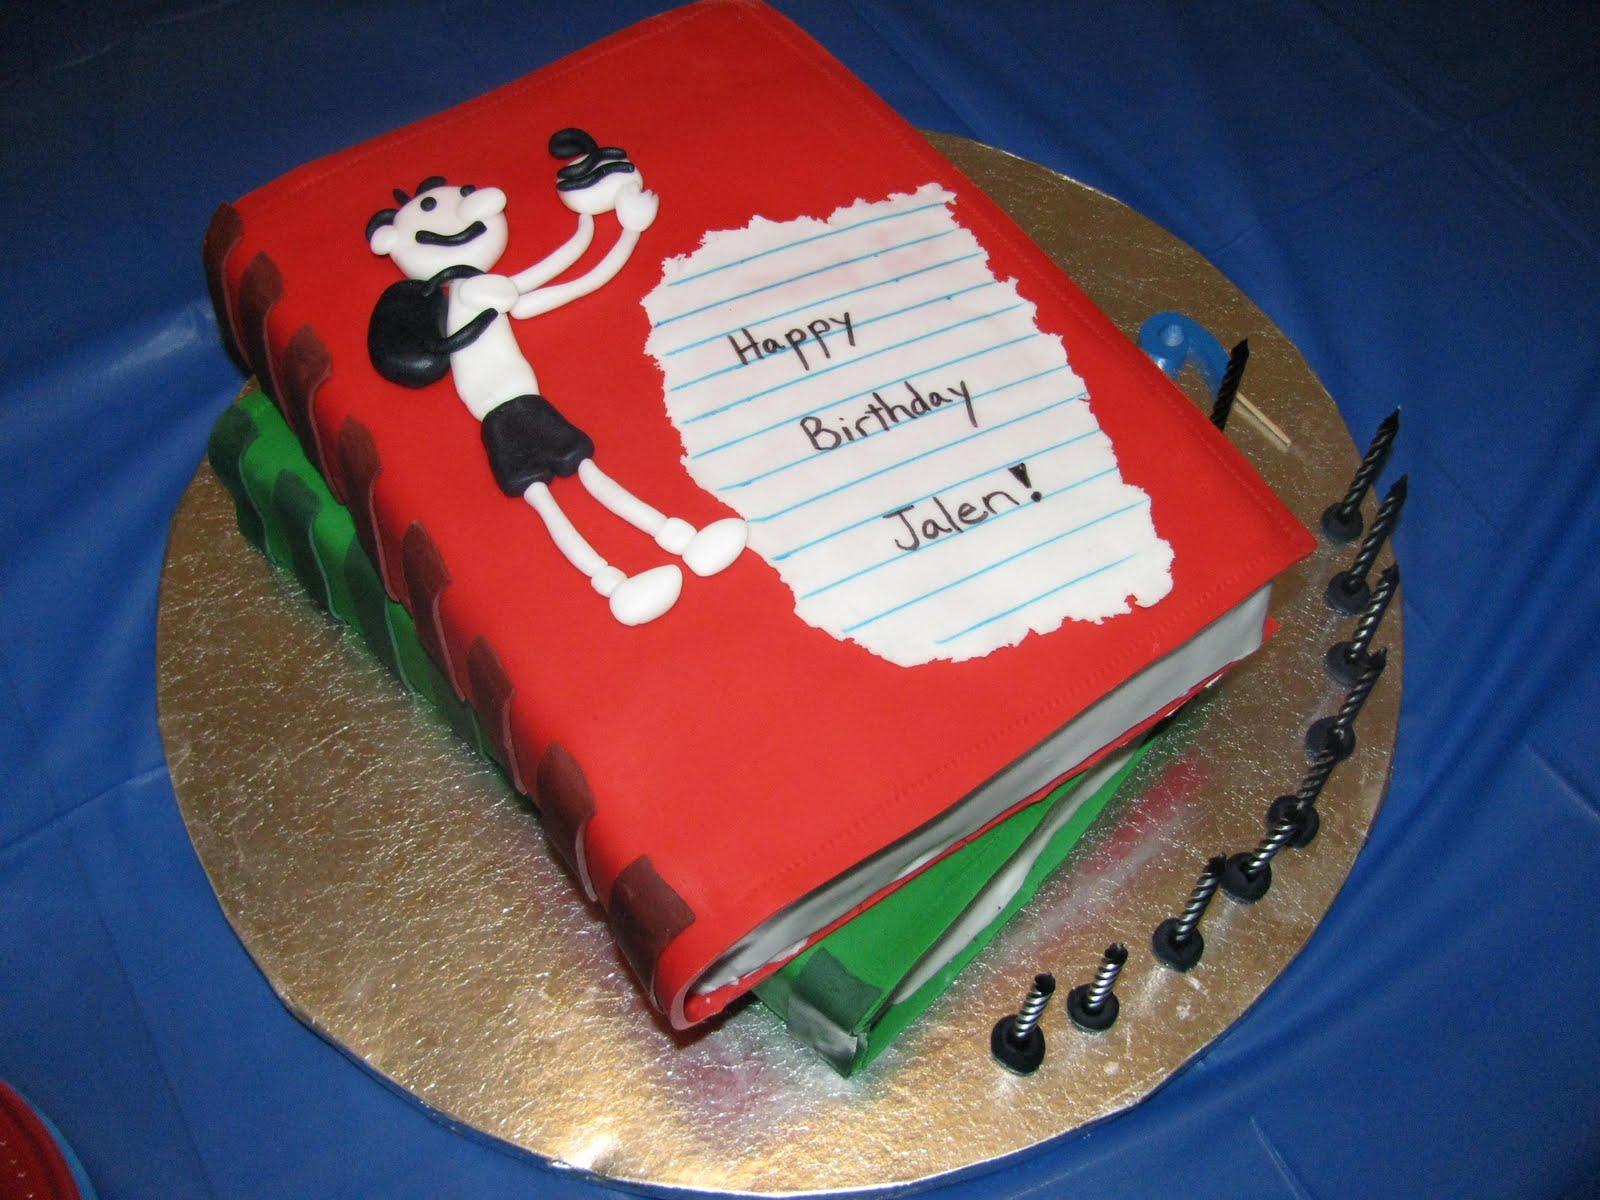 Cake Ideas 4 11 Year Old